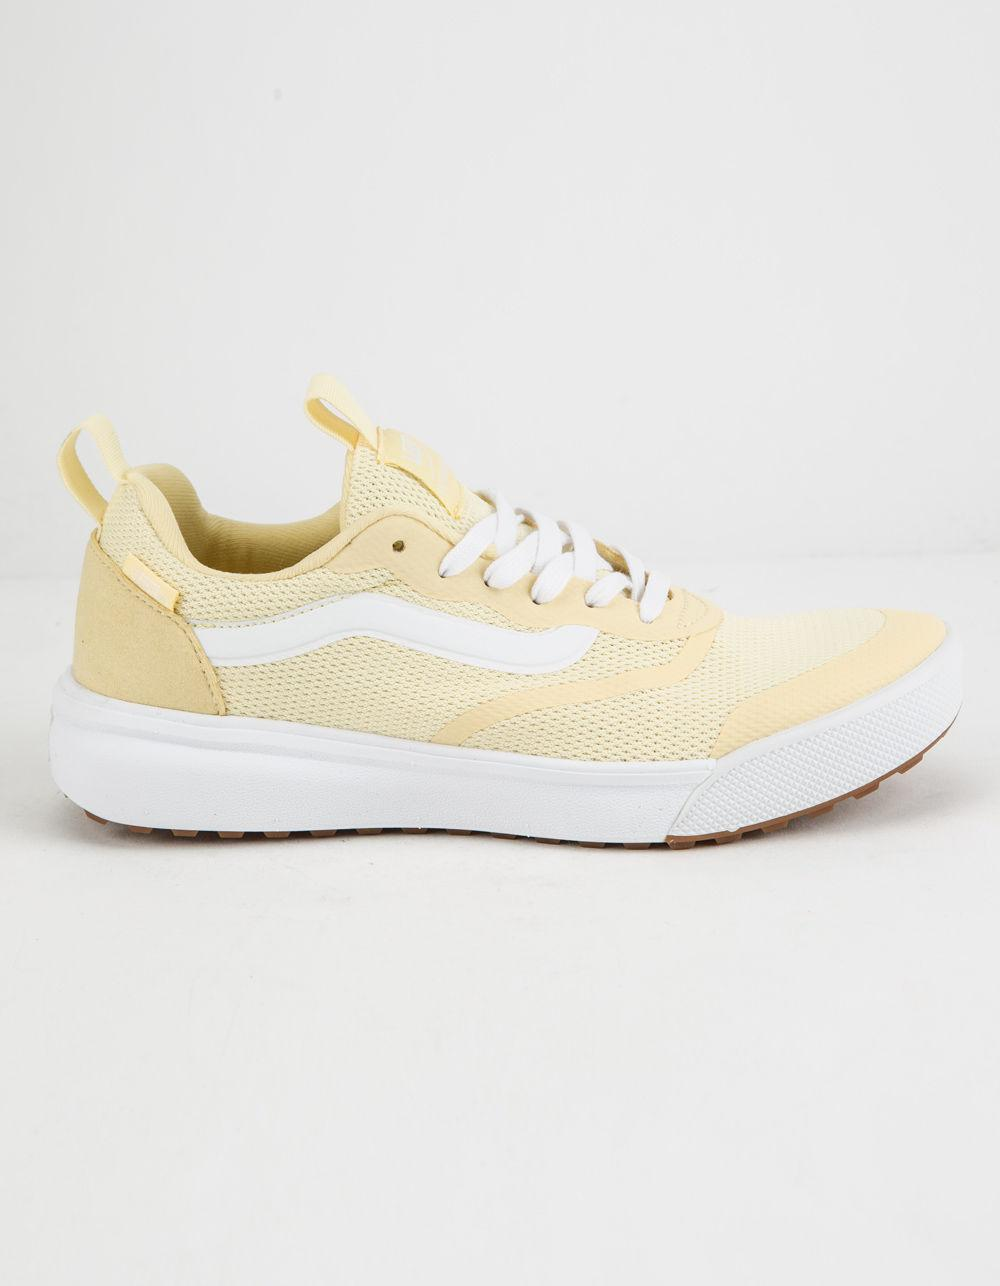 e0bc025da0 Lyst - Vans Ultrarange Rapidweld Pineapple Slice Womens Shoes in Yellow